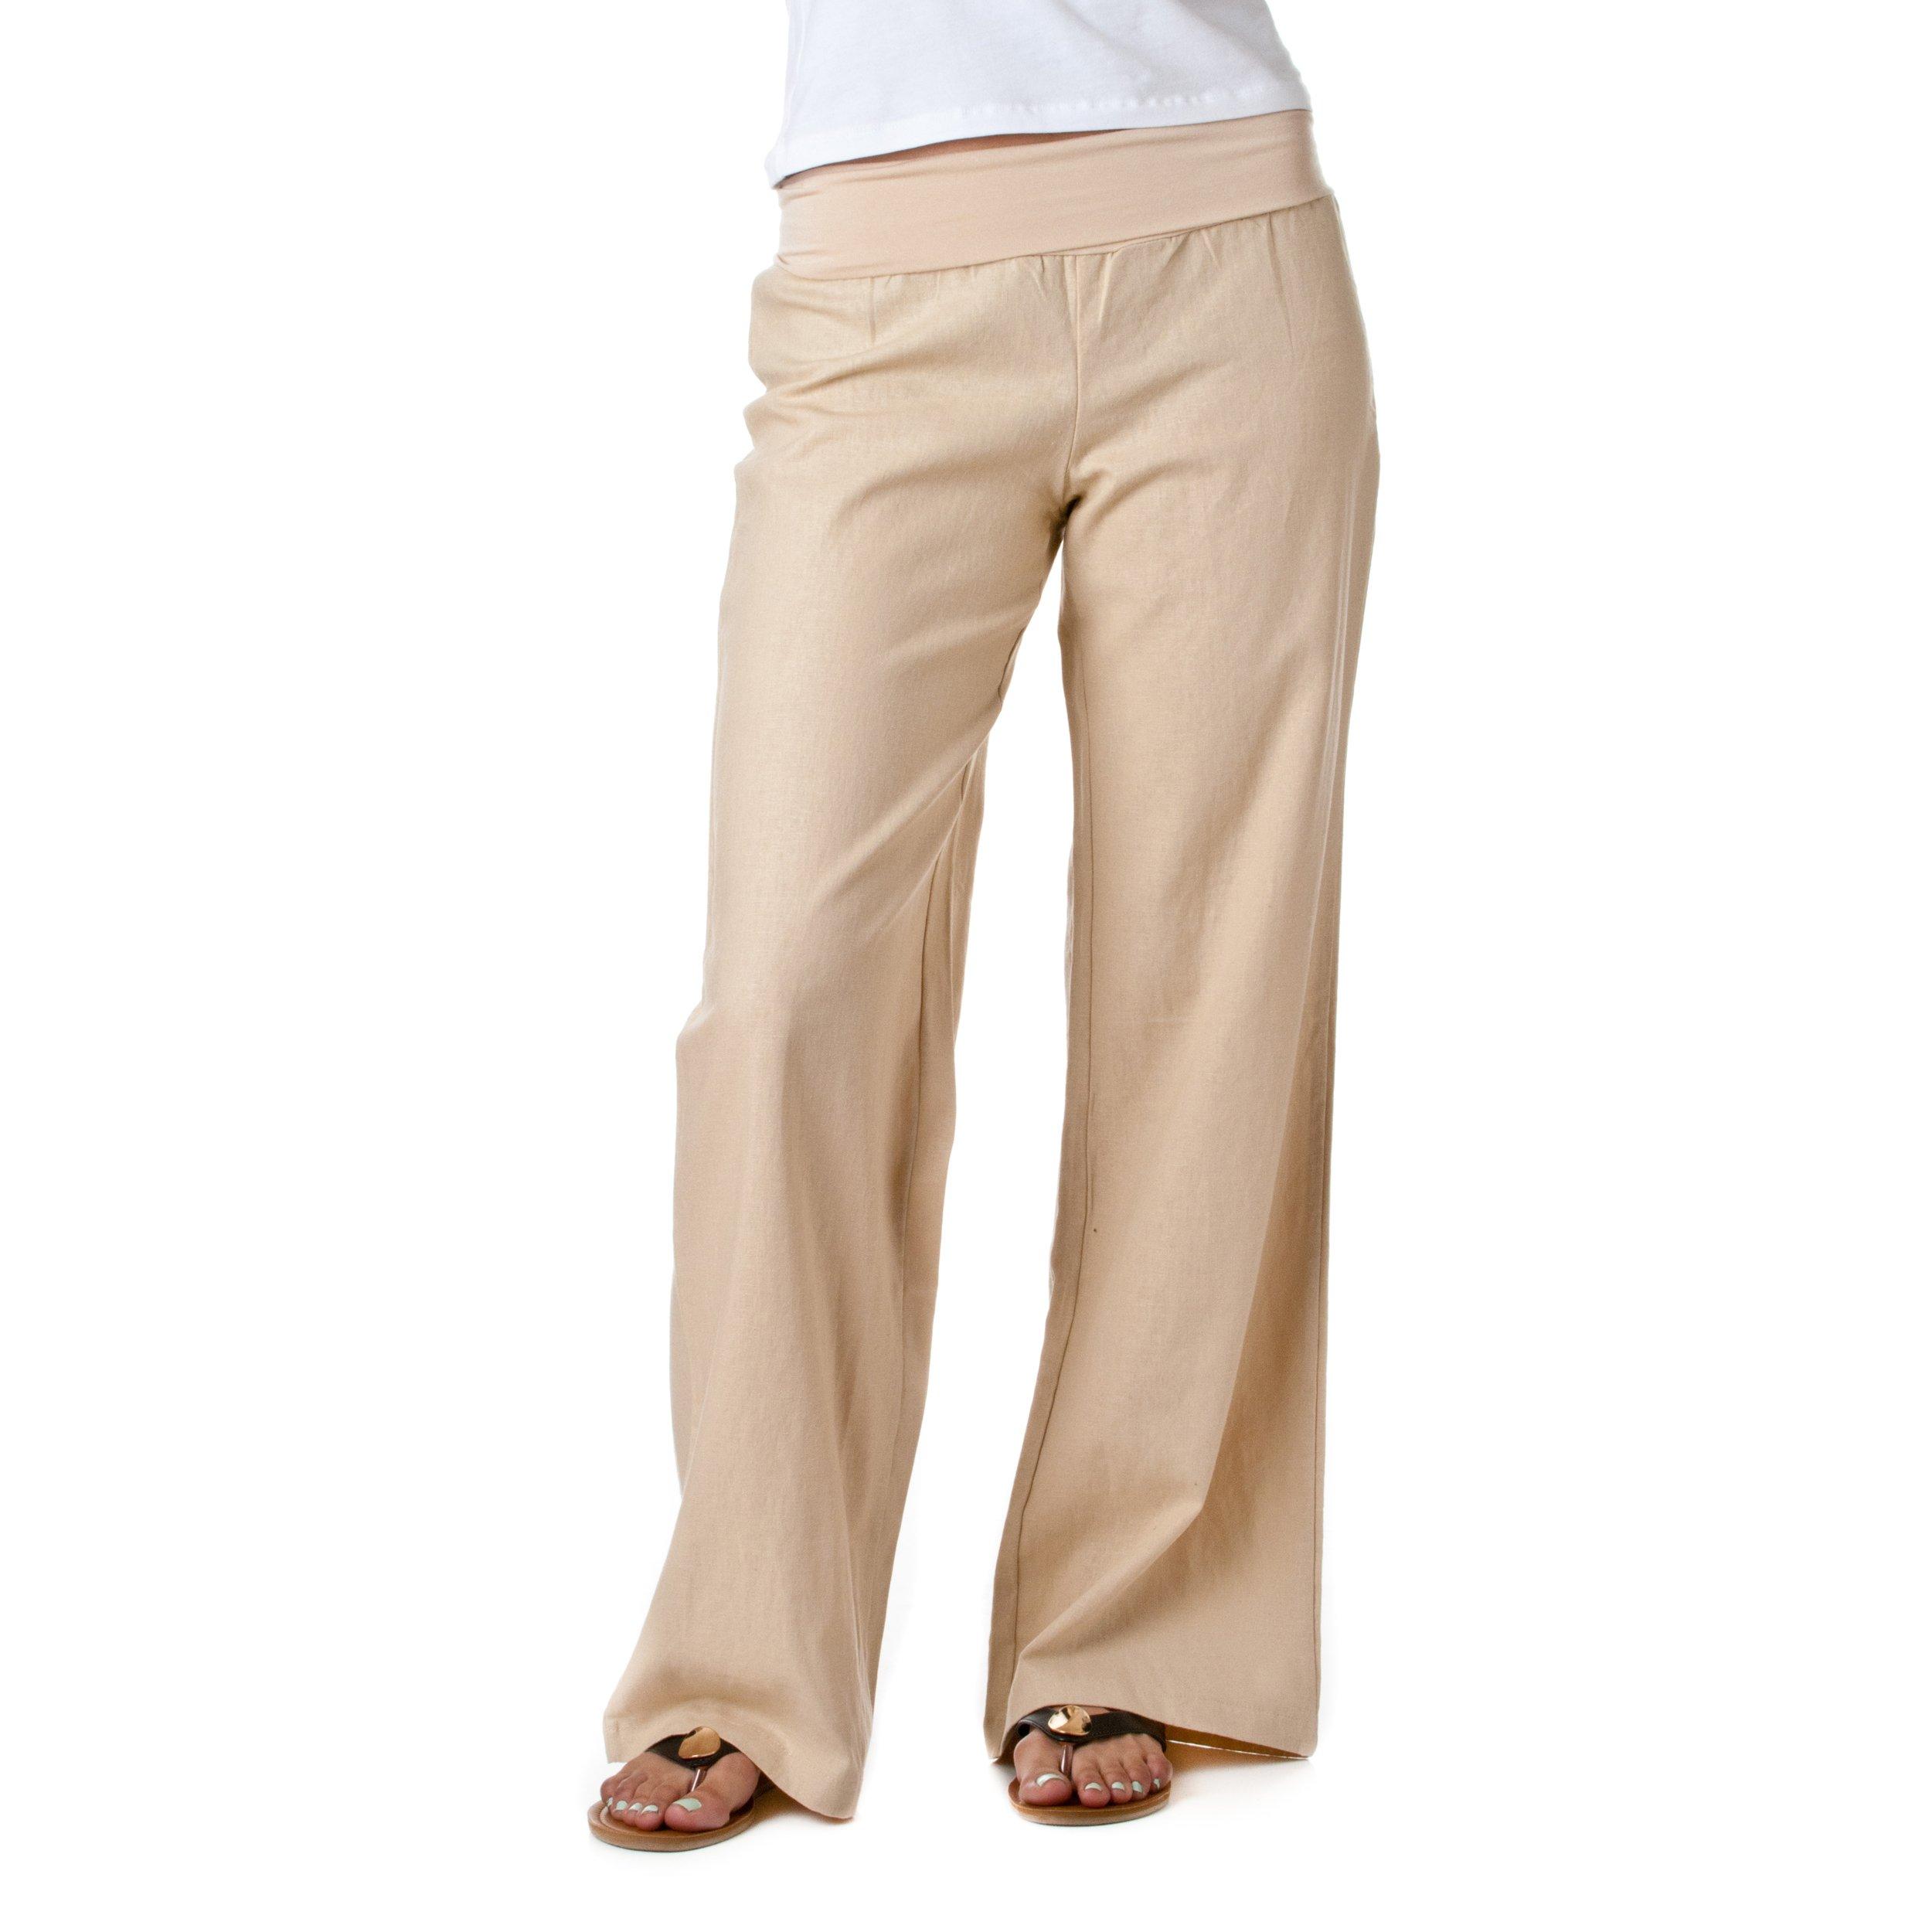 693ff93653815 MTRNTY Womens Maternity High Elastic Waist Comfortable Regular Fit Plain  Pants